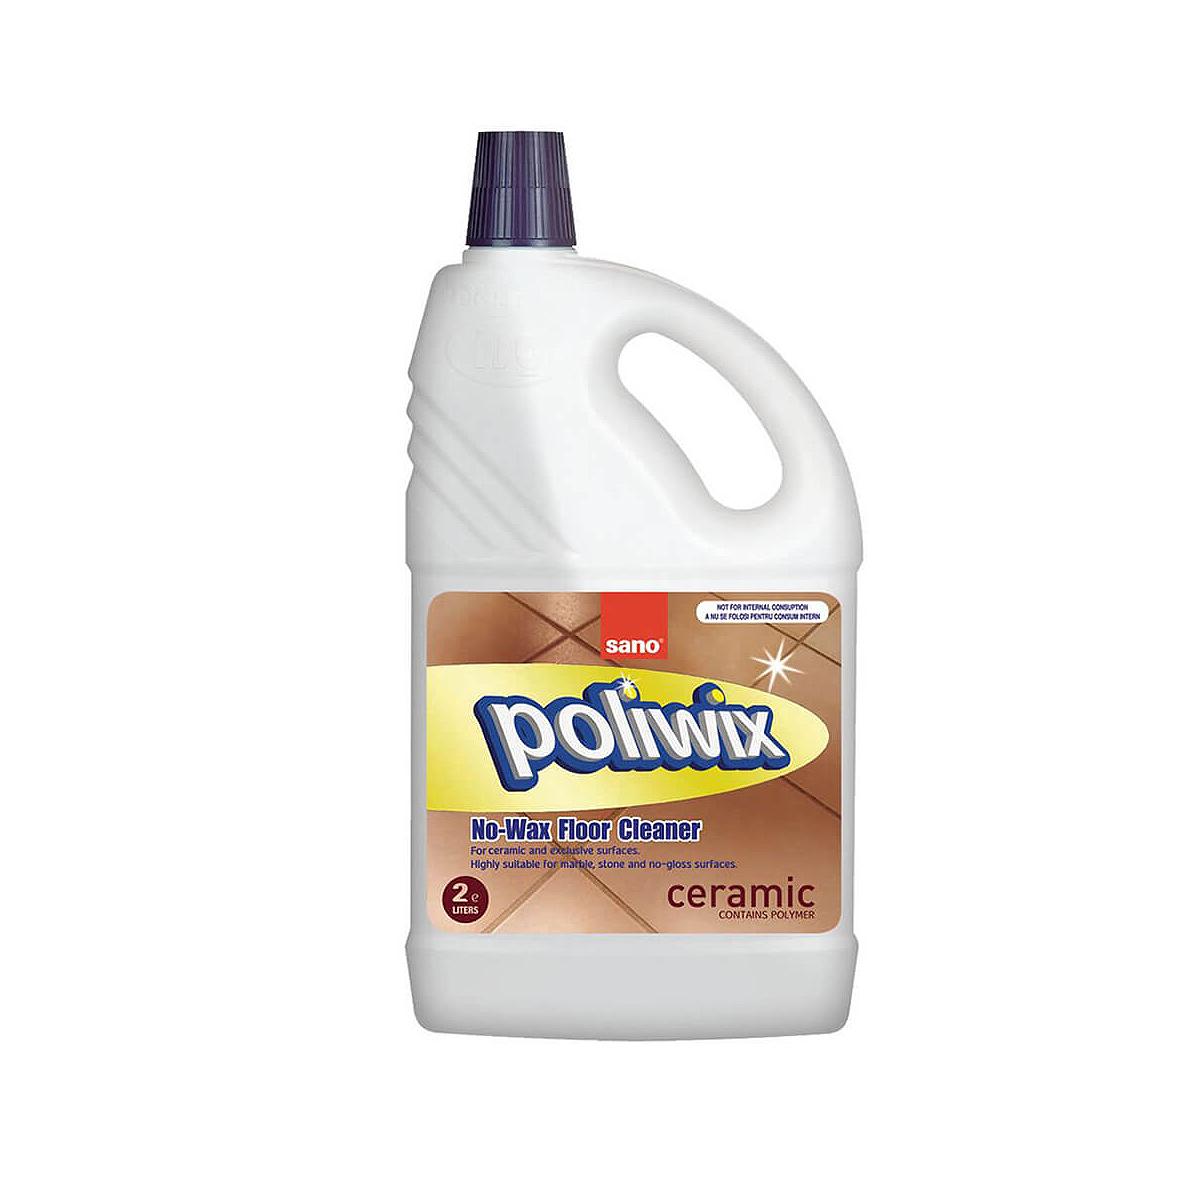 Detergent Pentru Pardoseli, Poliwix Ceramic, 2 Litri, Sano, 327041214